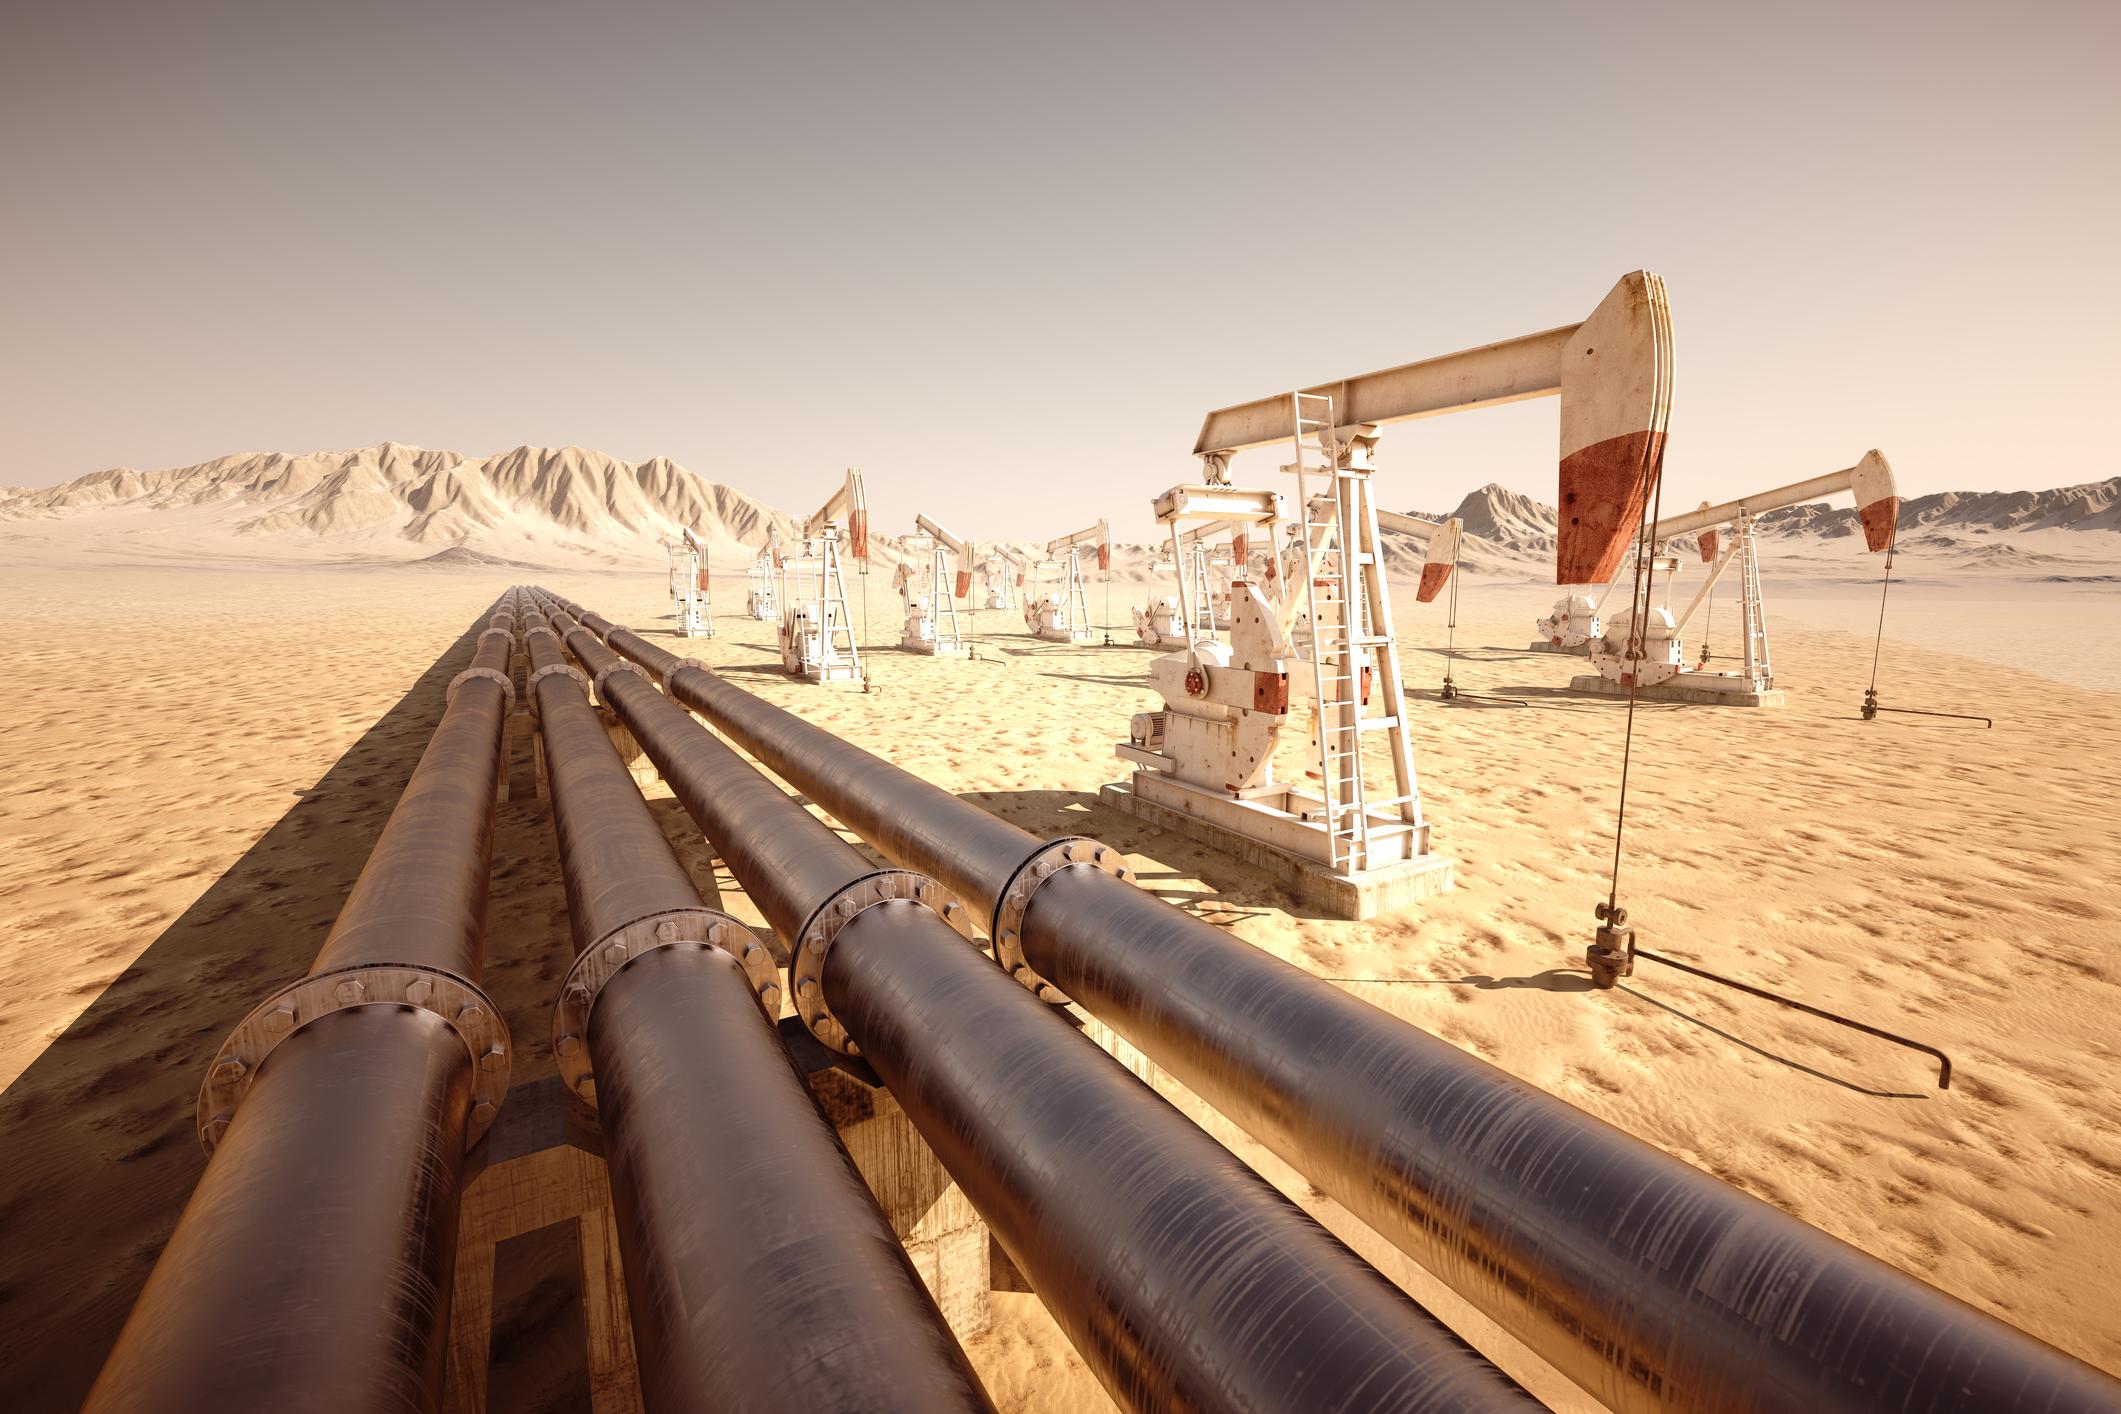 Pipelines run past oil wells in a desert landscape